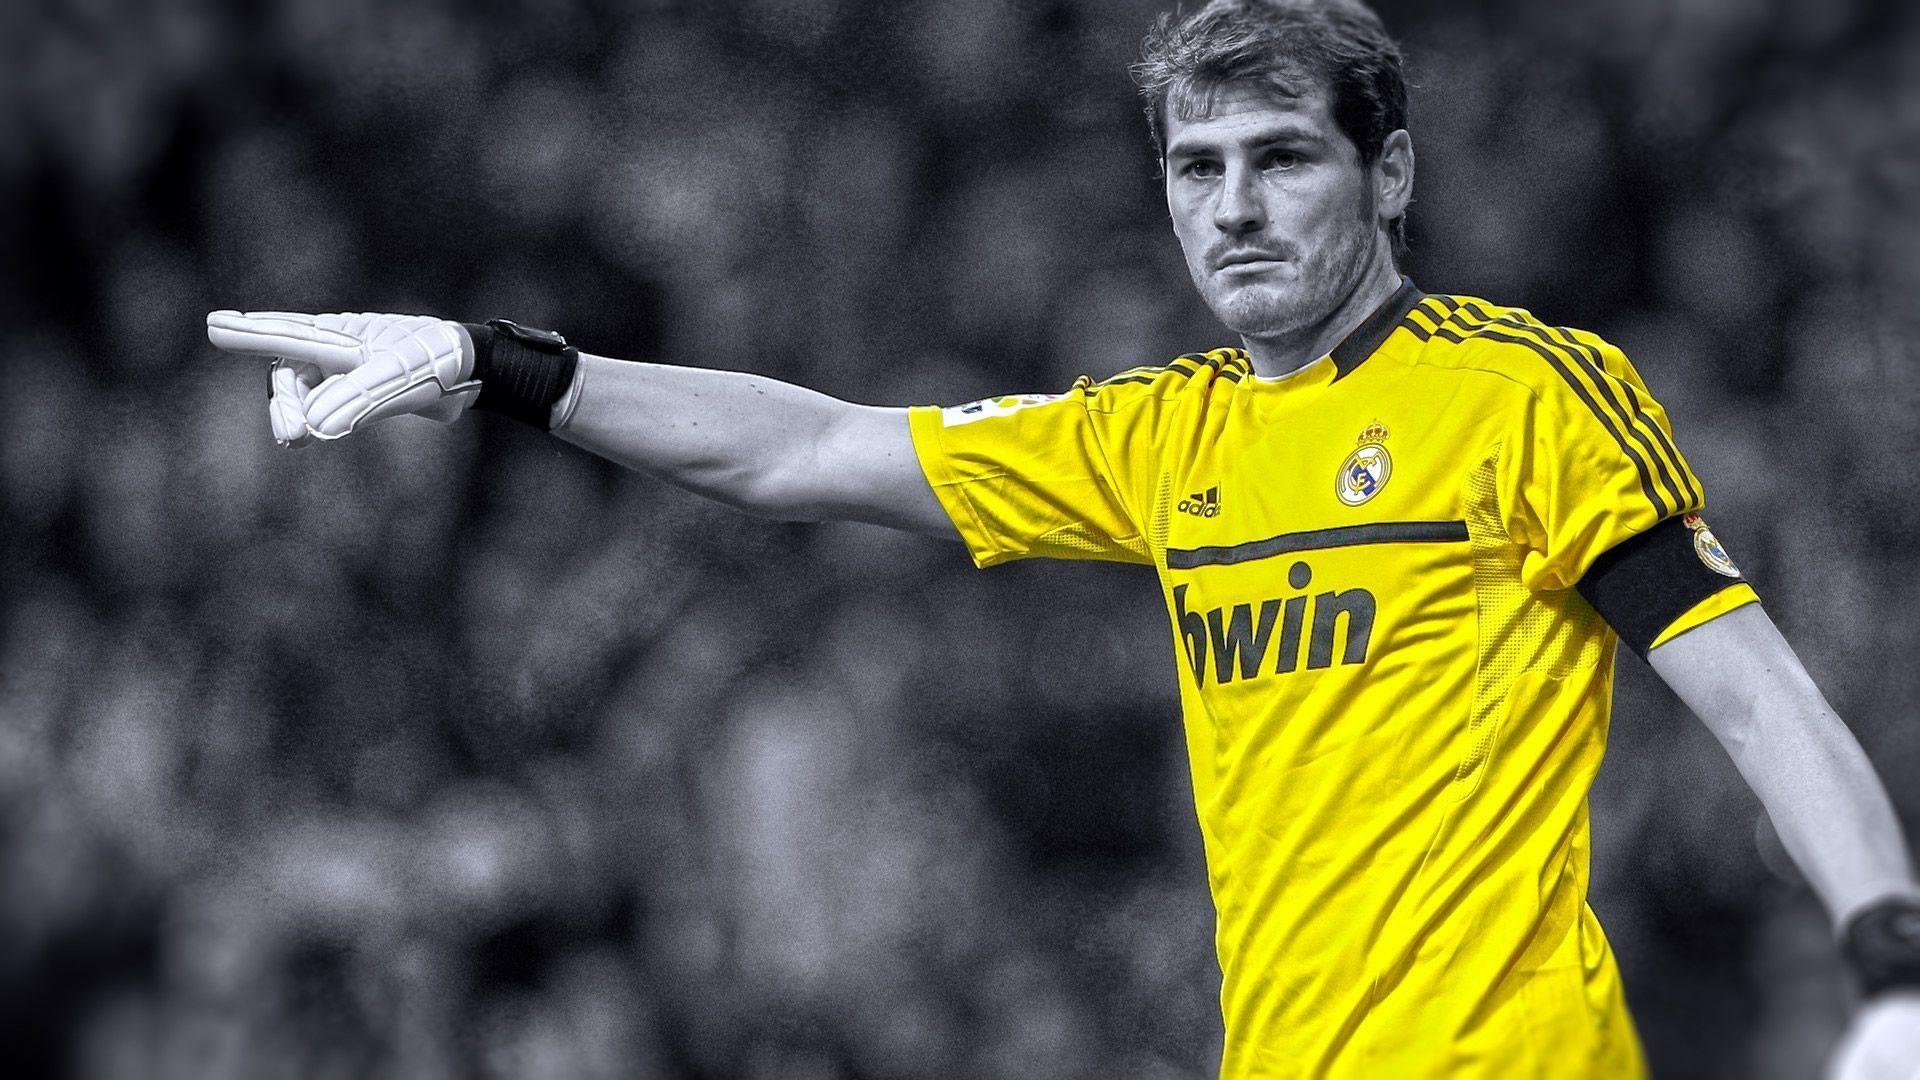 Iker Casillas Fc Real Madrid Hd Wallpaper 2014